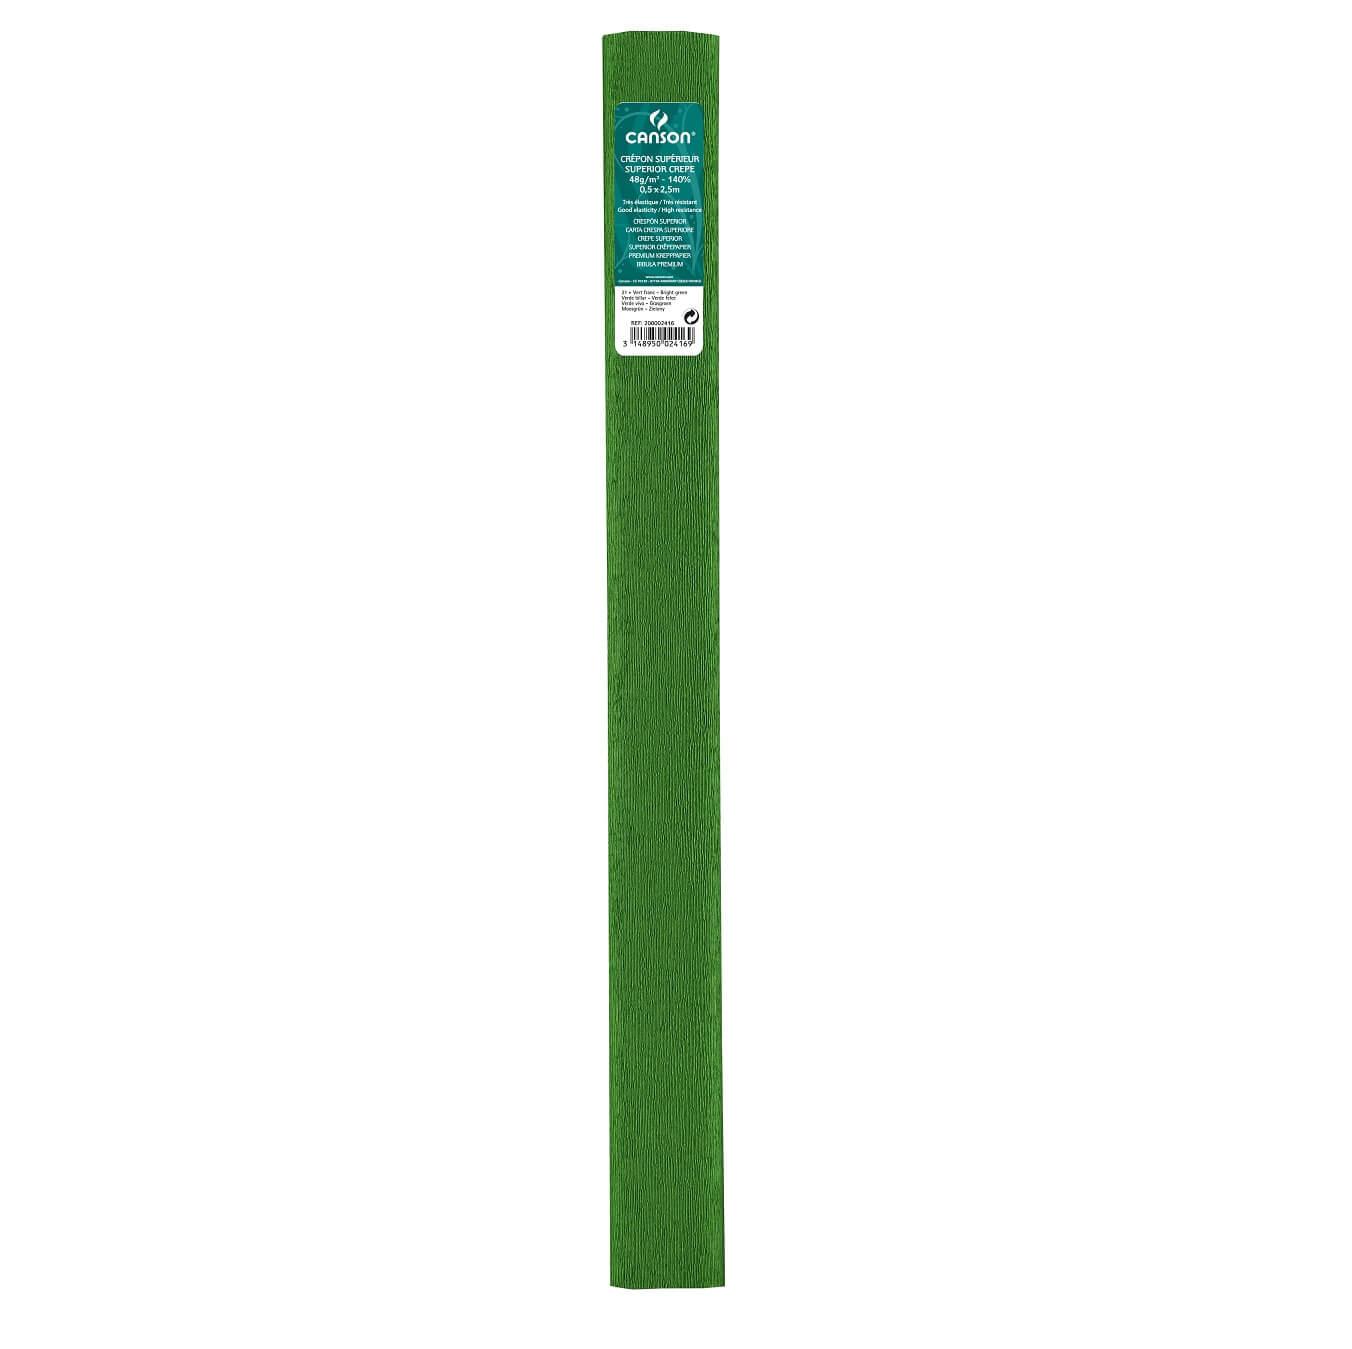 Papier crepon 48g vert